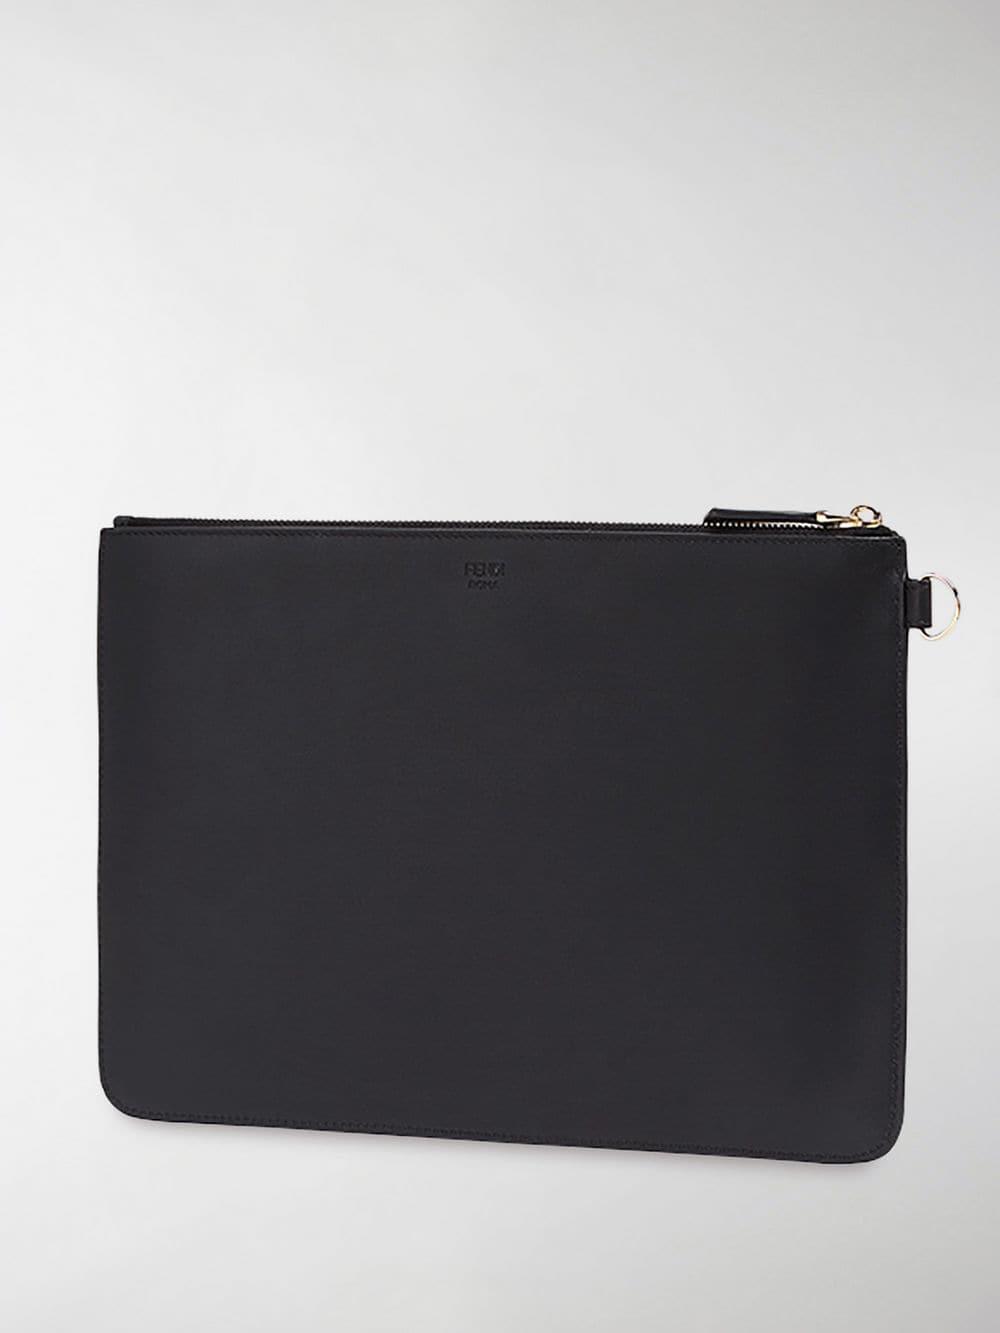 f22d9164f690 Fendi - Black Bag Bug Pouch for Men - Lyst. View fullscreen